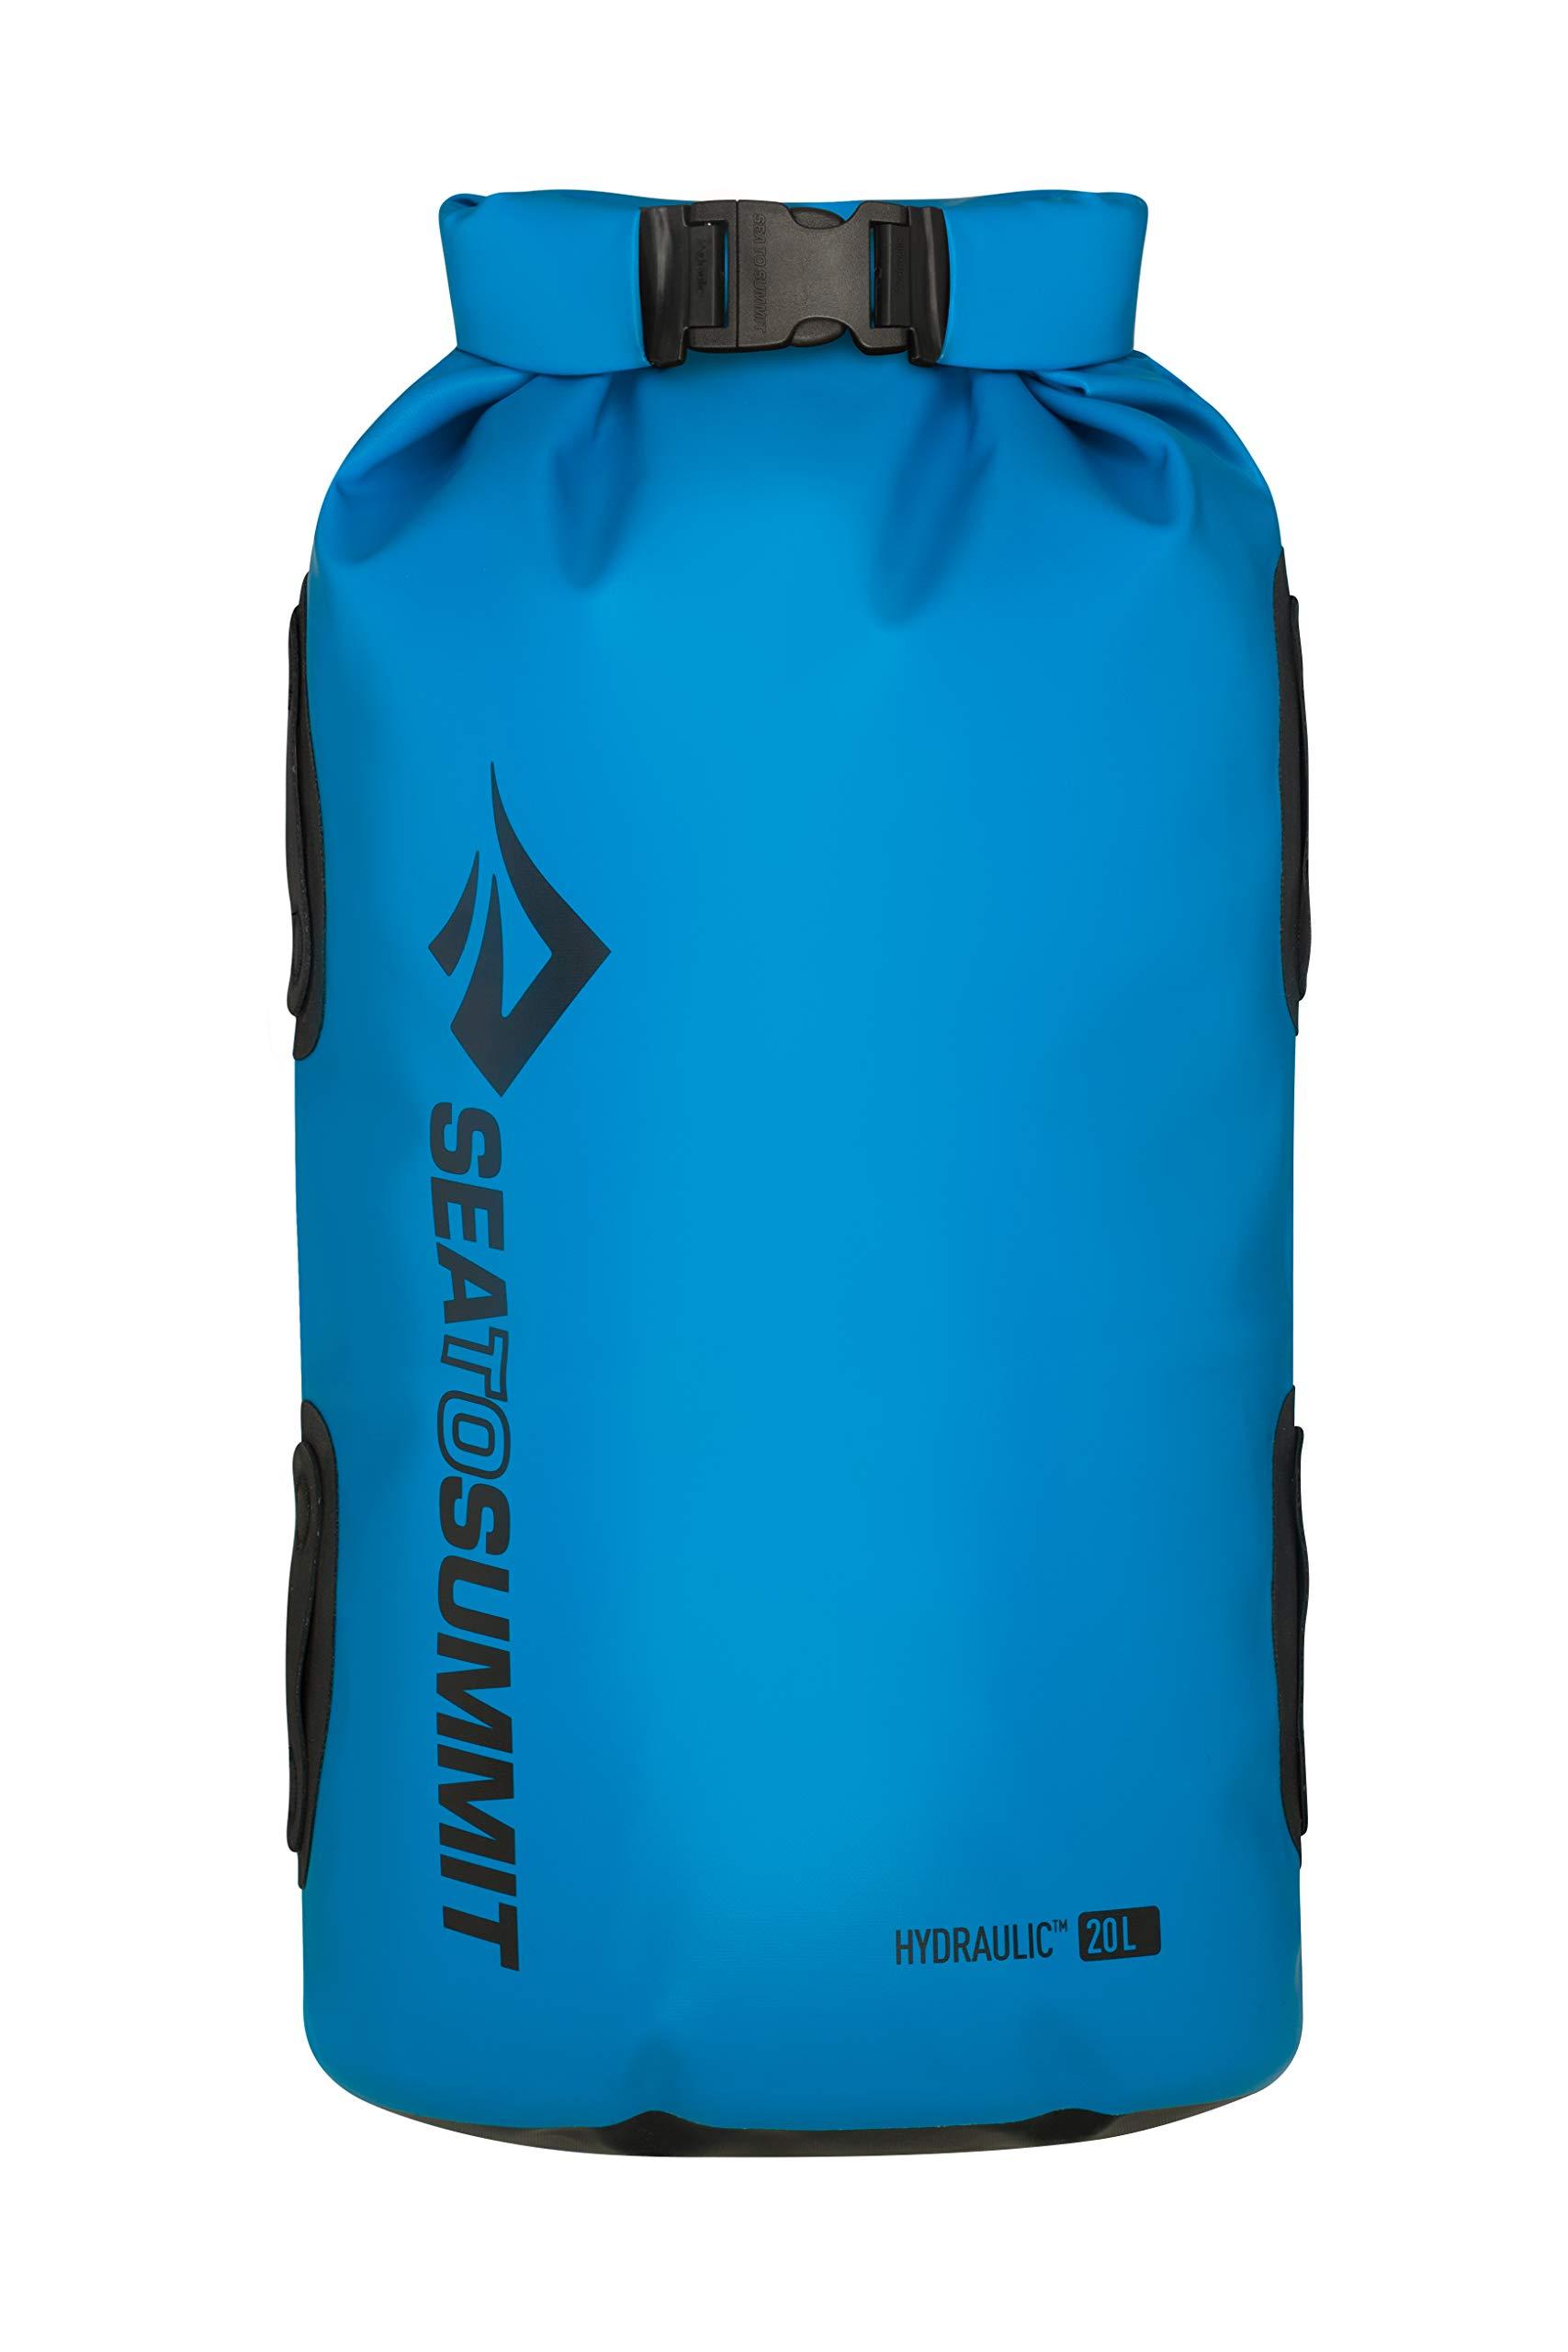 Sea to Summit Hydraulic Dry Bag, Blue, 20 Liter by Sea to Summit